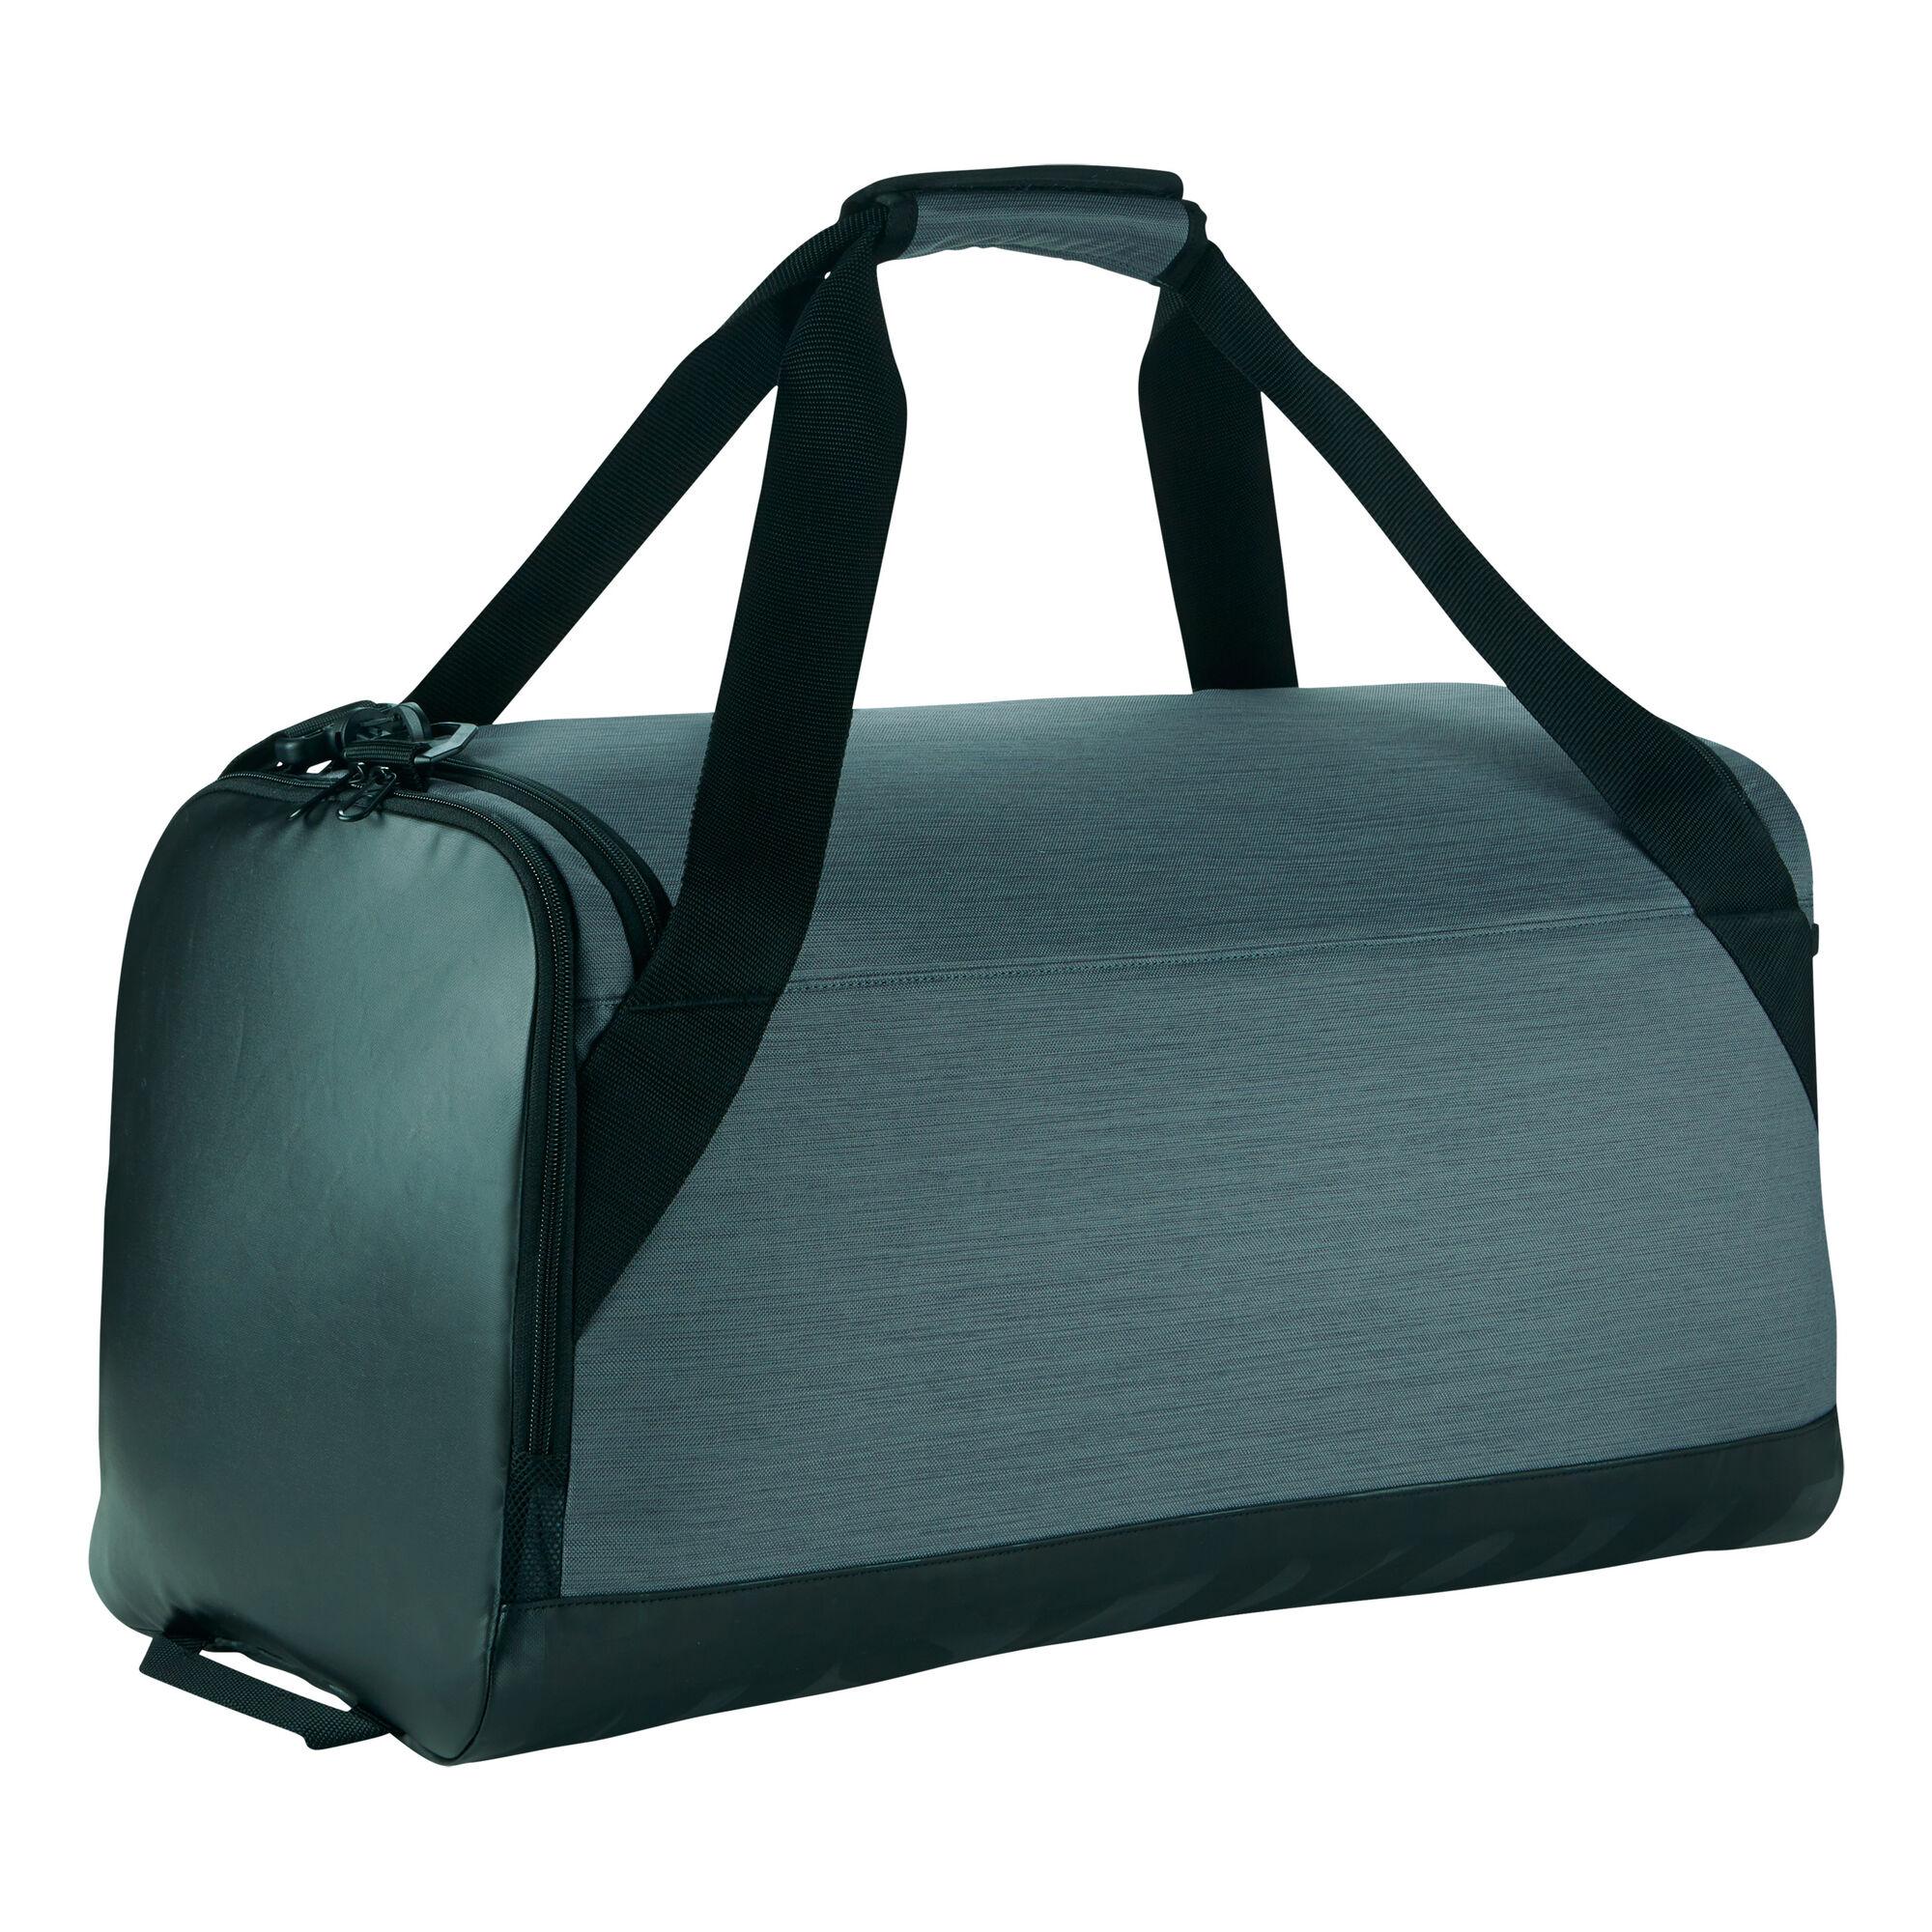 nike brasilia duffel sporttasche mittel grau schwarz. Black Bedroom Furniture Sets. Home Design Ideas